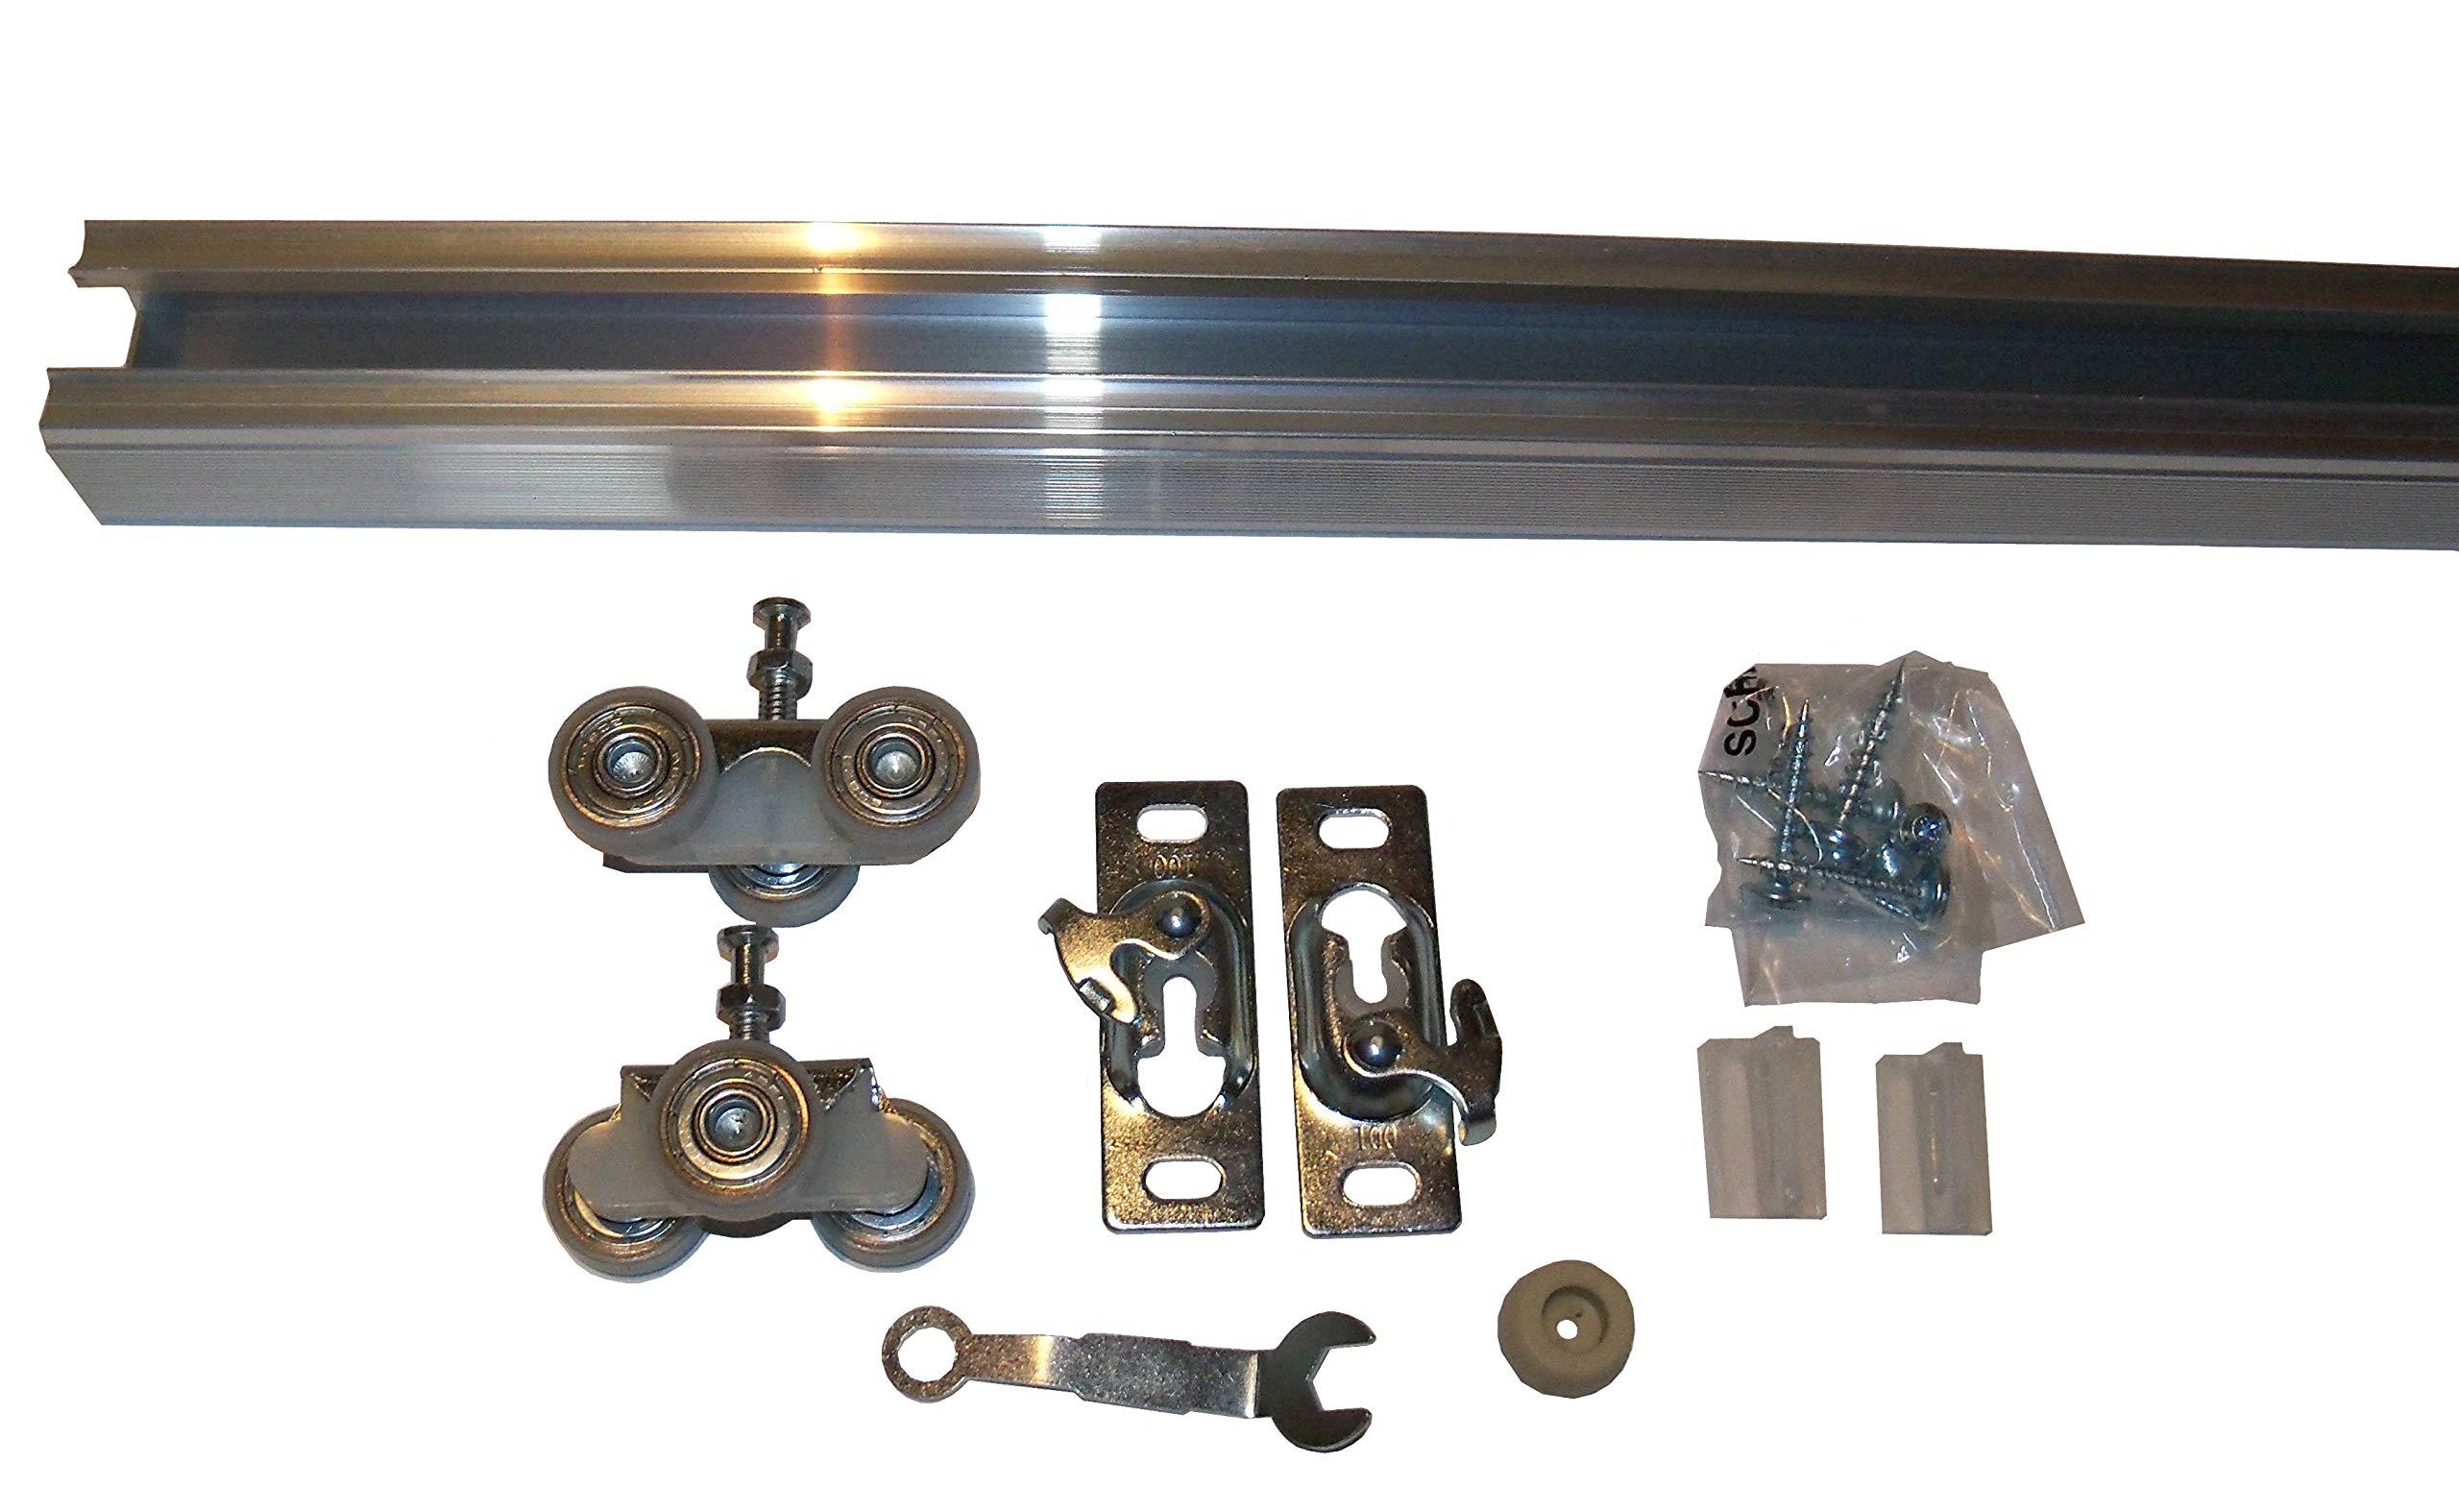 Series 2 HBP Heavy Duty Pocket Door Track and Hardware Kit (48'')